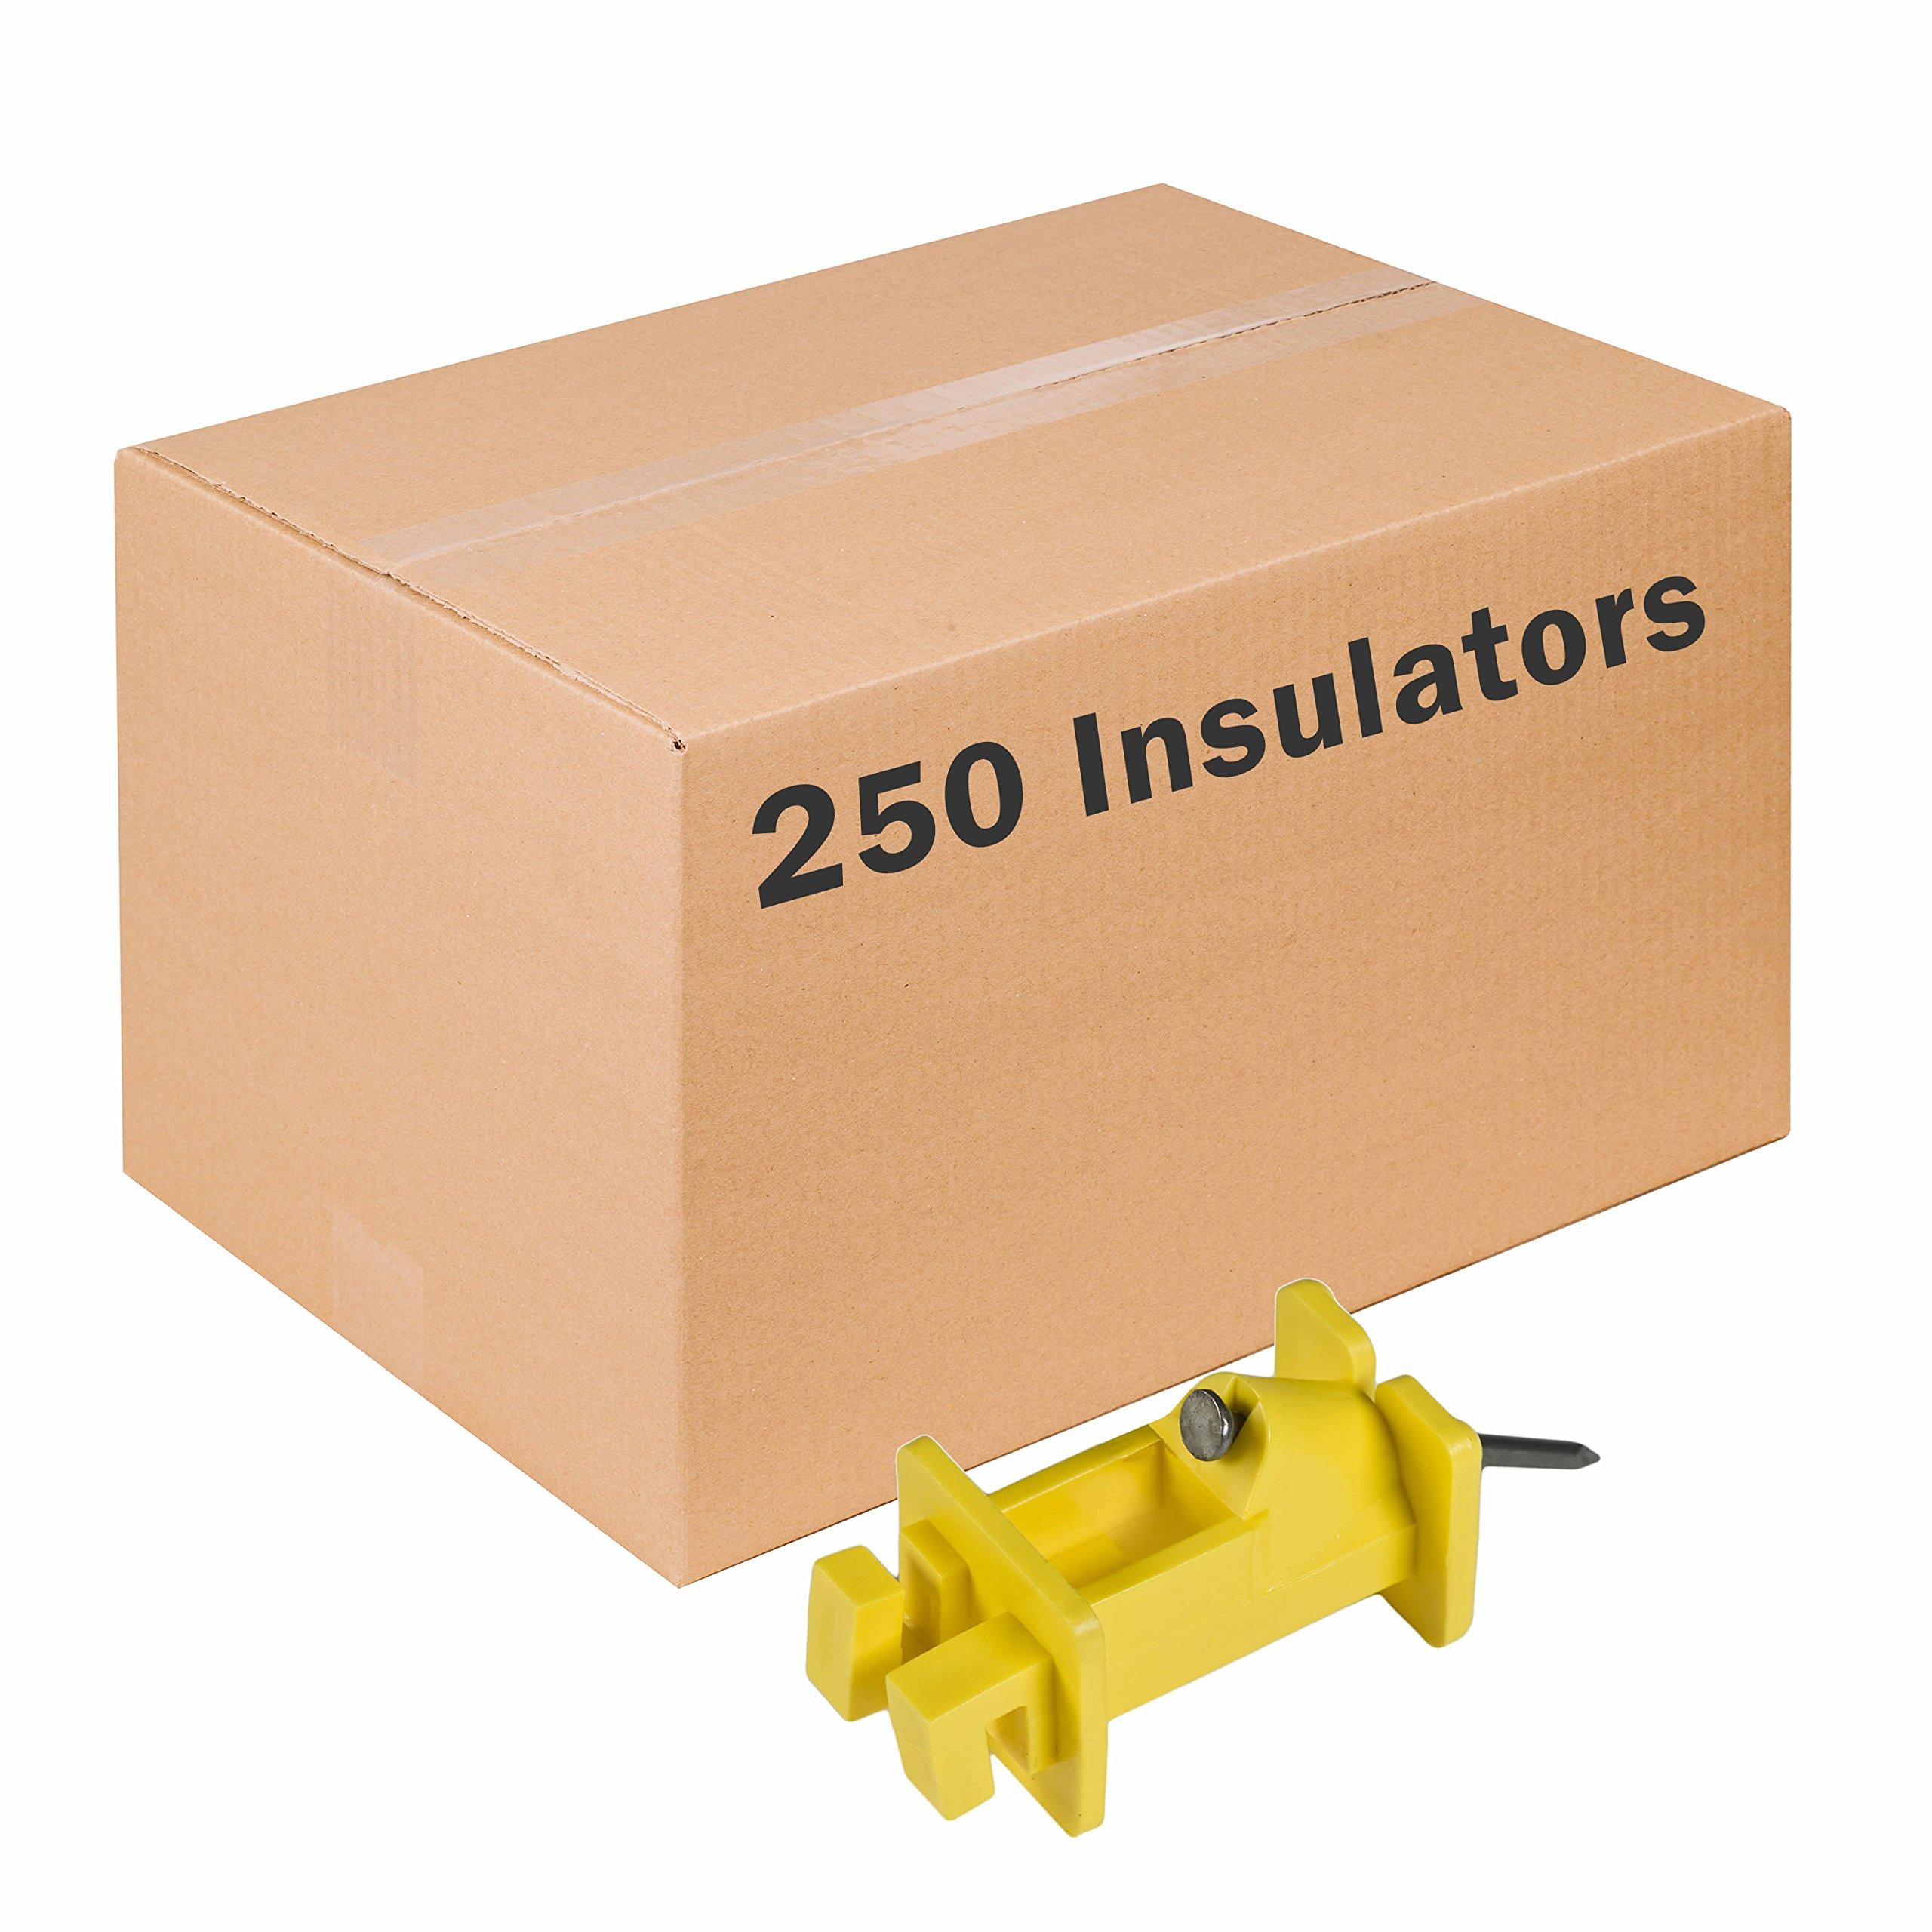 Safer Brand Zareba IWNY-Z Yellow Slant Nail Insulator - 250 Pack